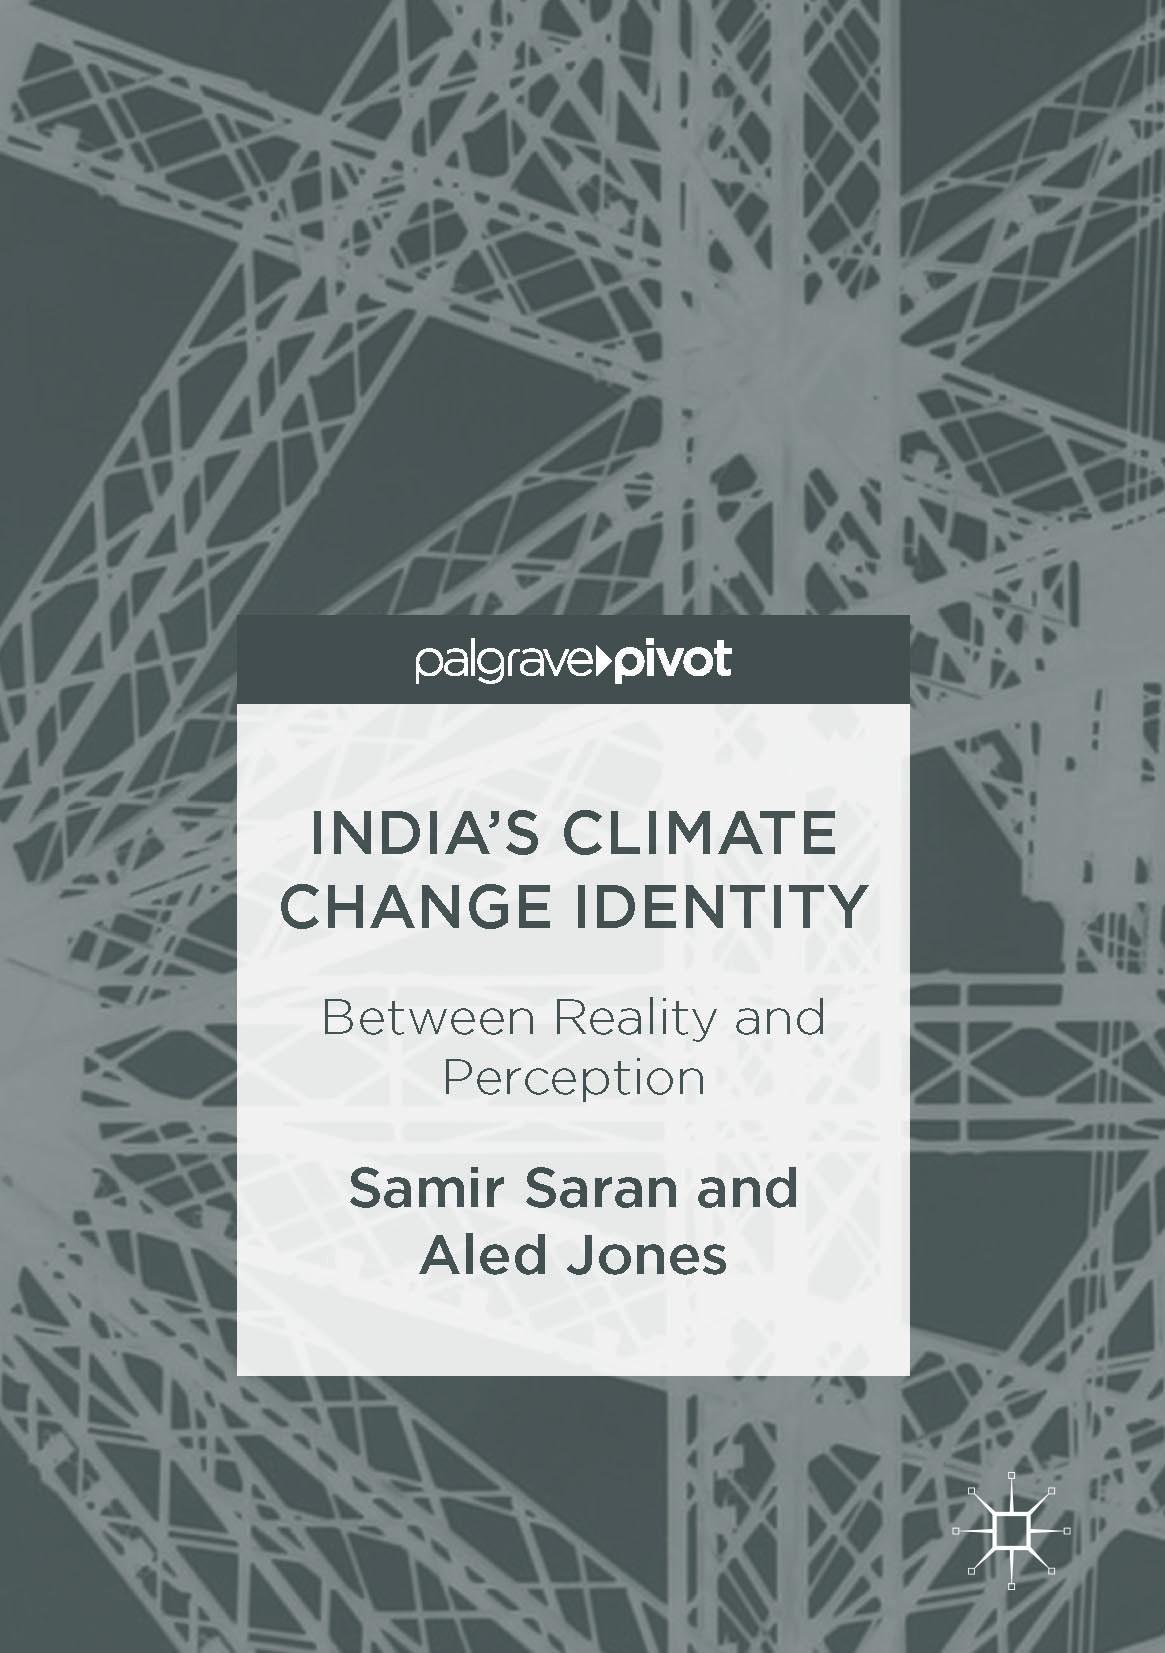 Jones, Aled - India's Climate Change Identity, ebook